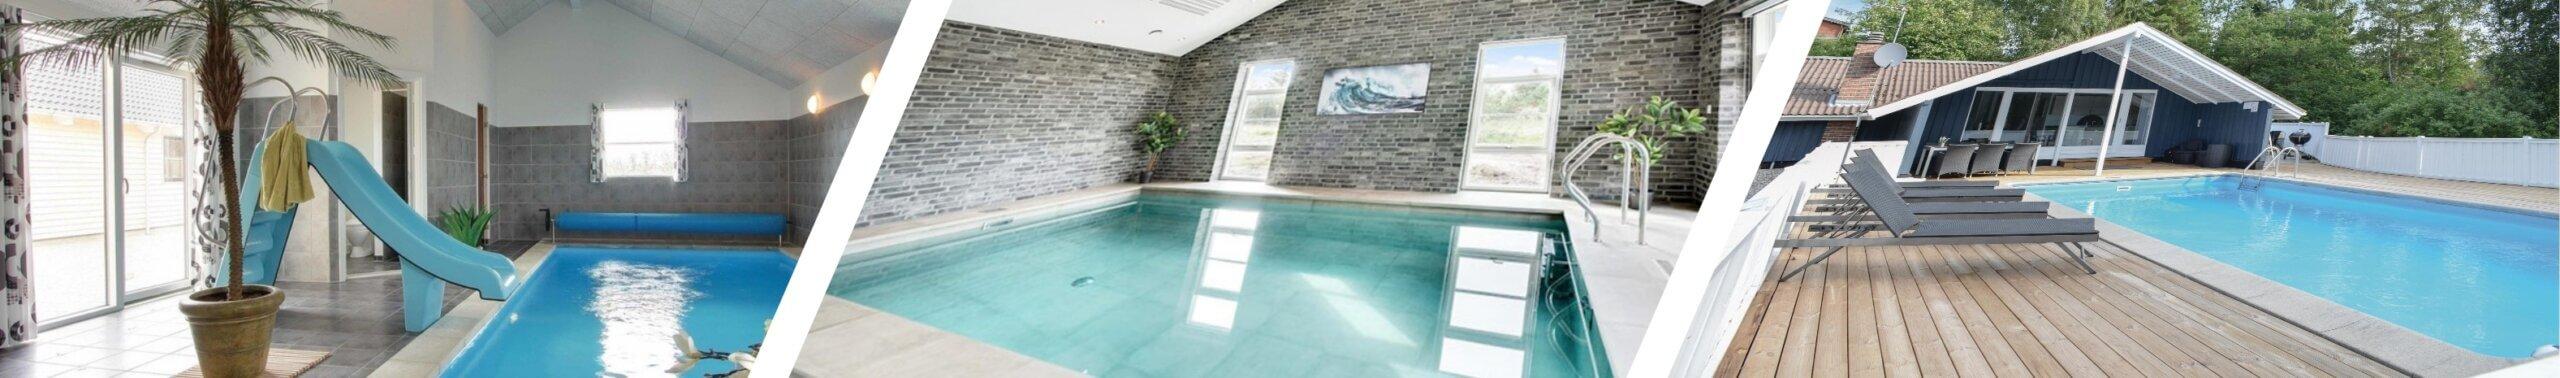 Sommerhuse_med_pool_i_jylland_pool_sommerhuse